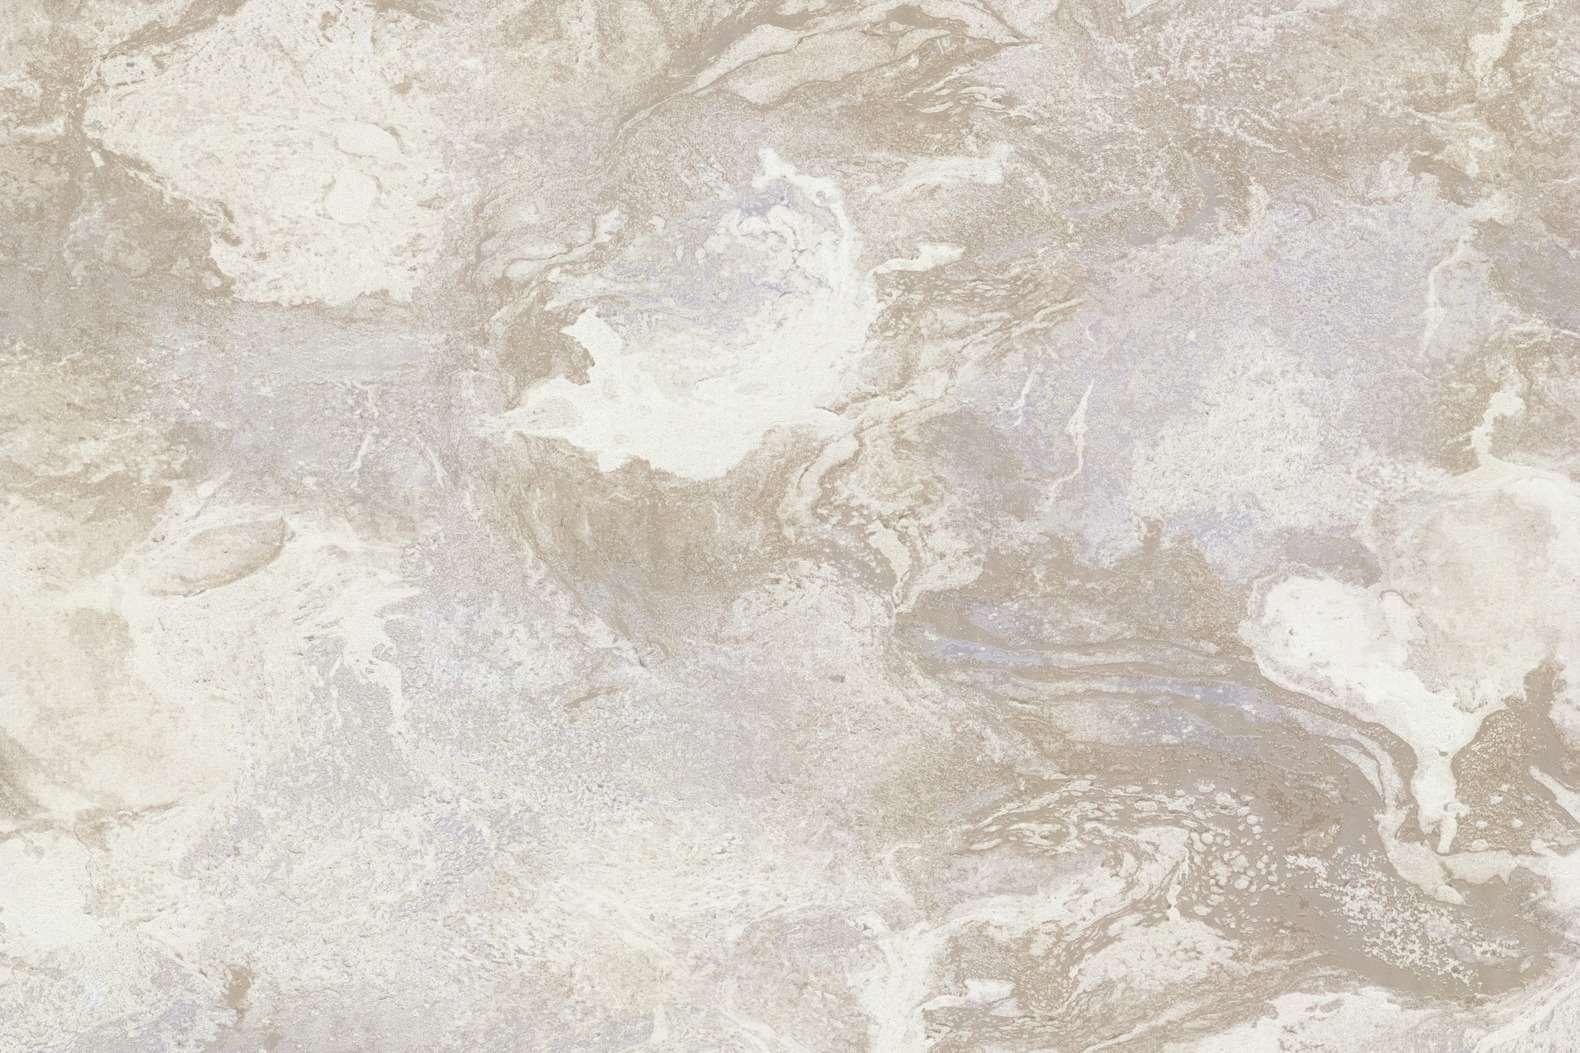 Обои Decori & Decori Carrara 2 — Декори Каррара 2 83672